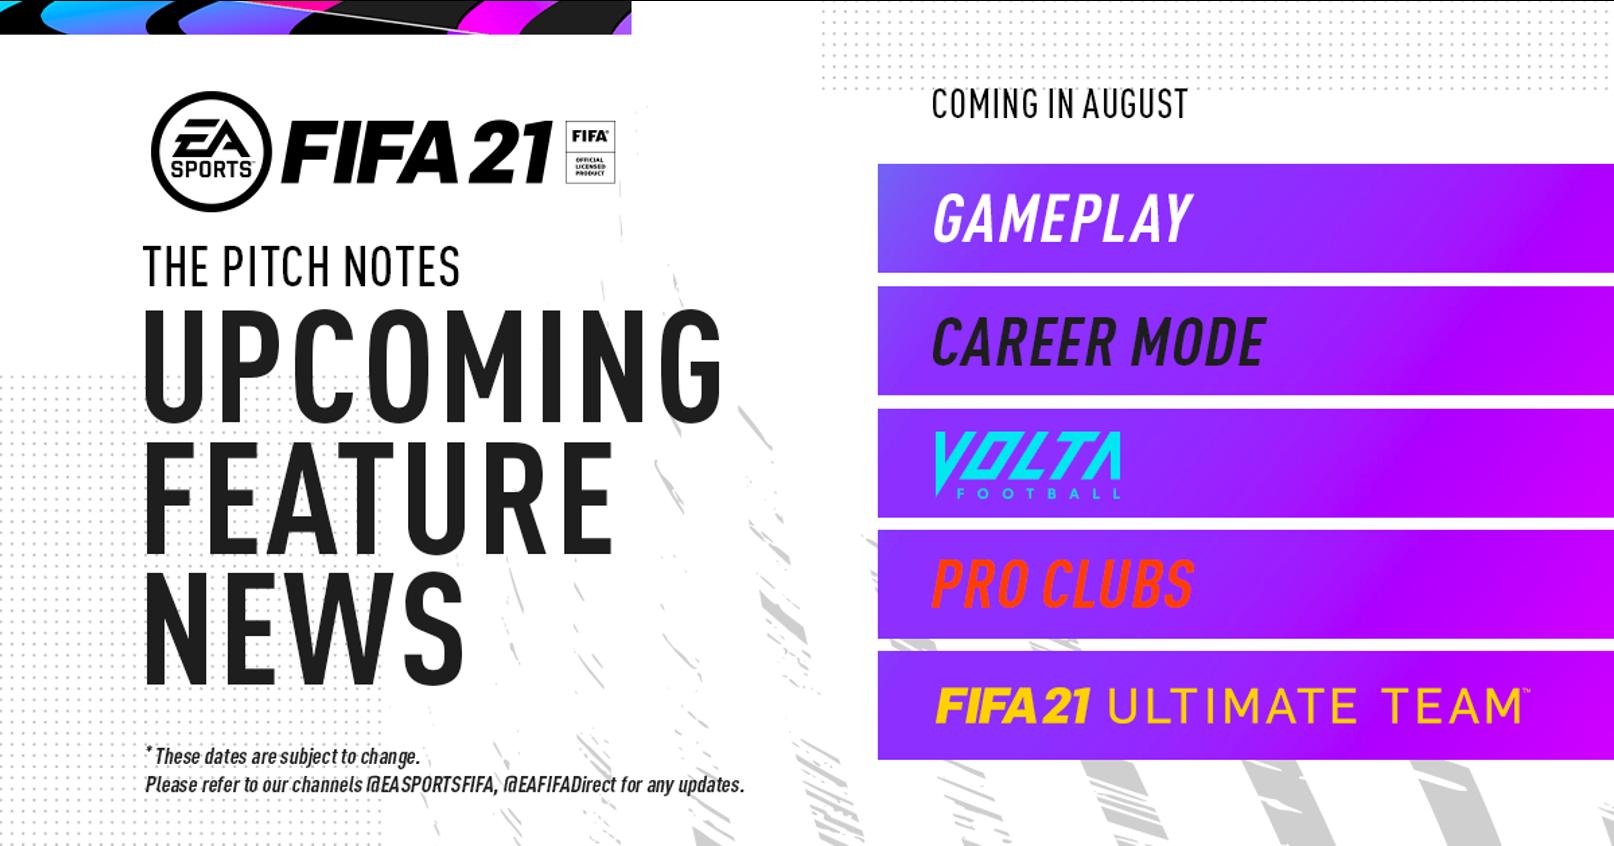 FIFA 21's content schedule